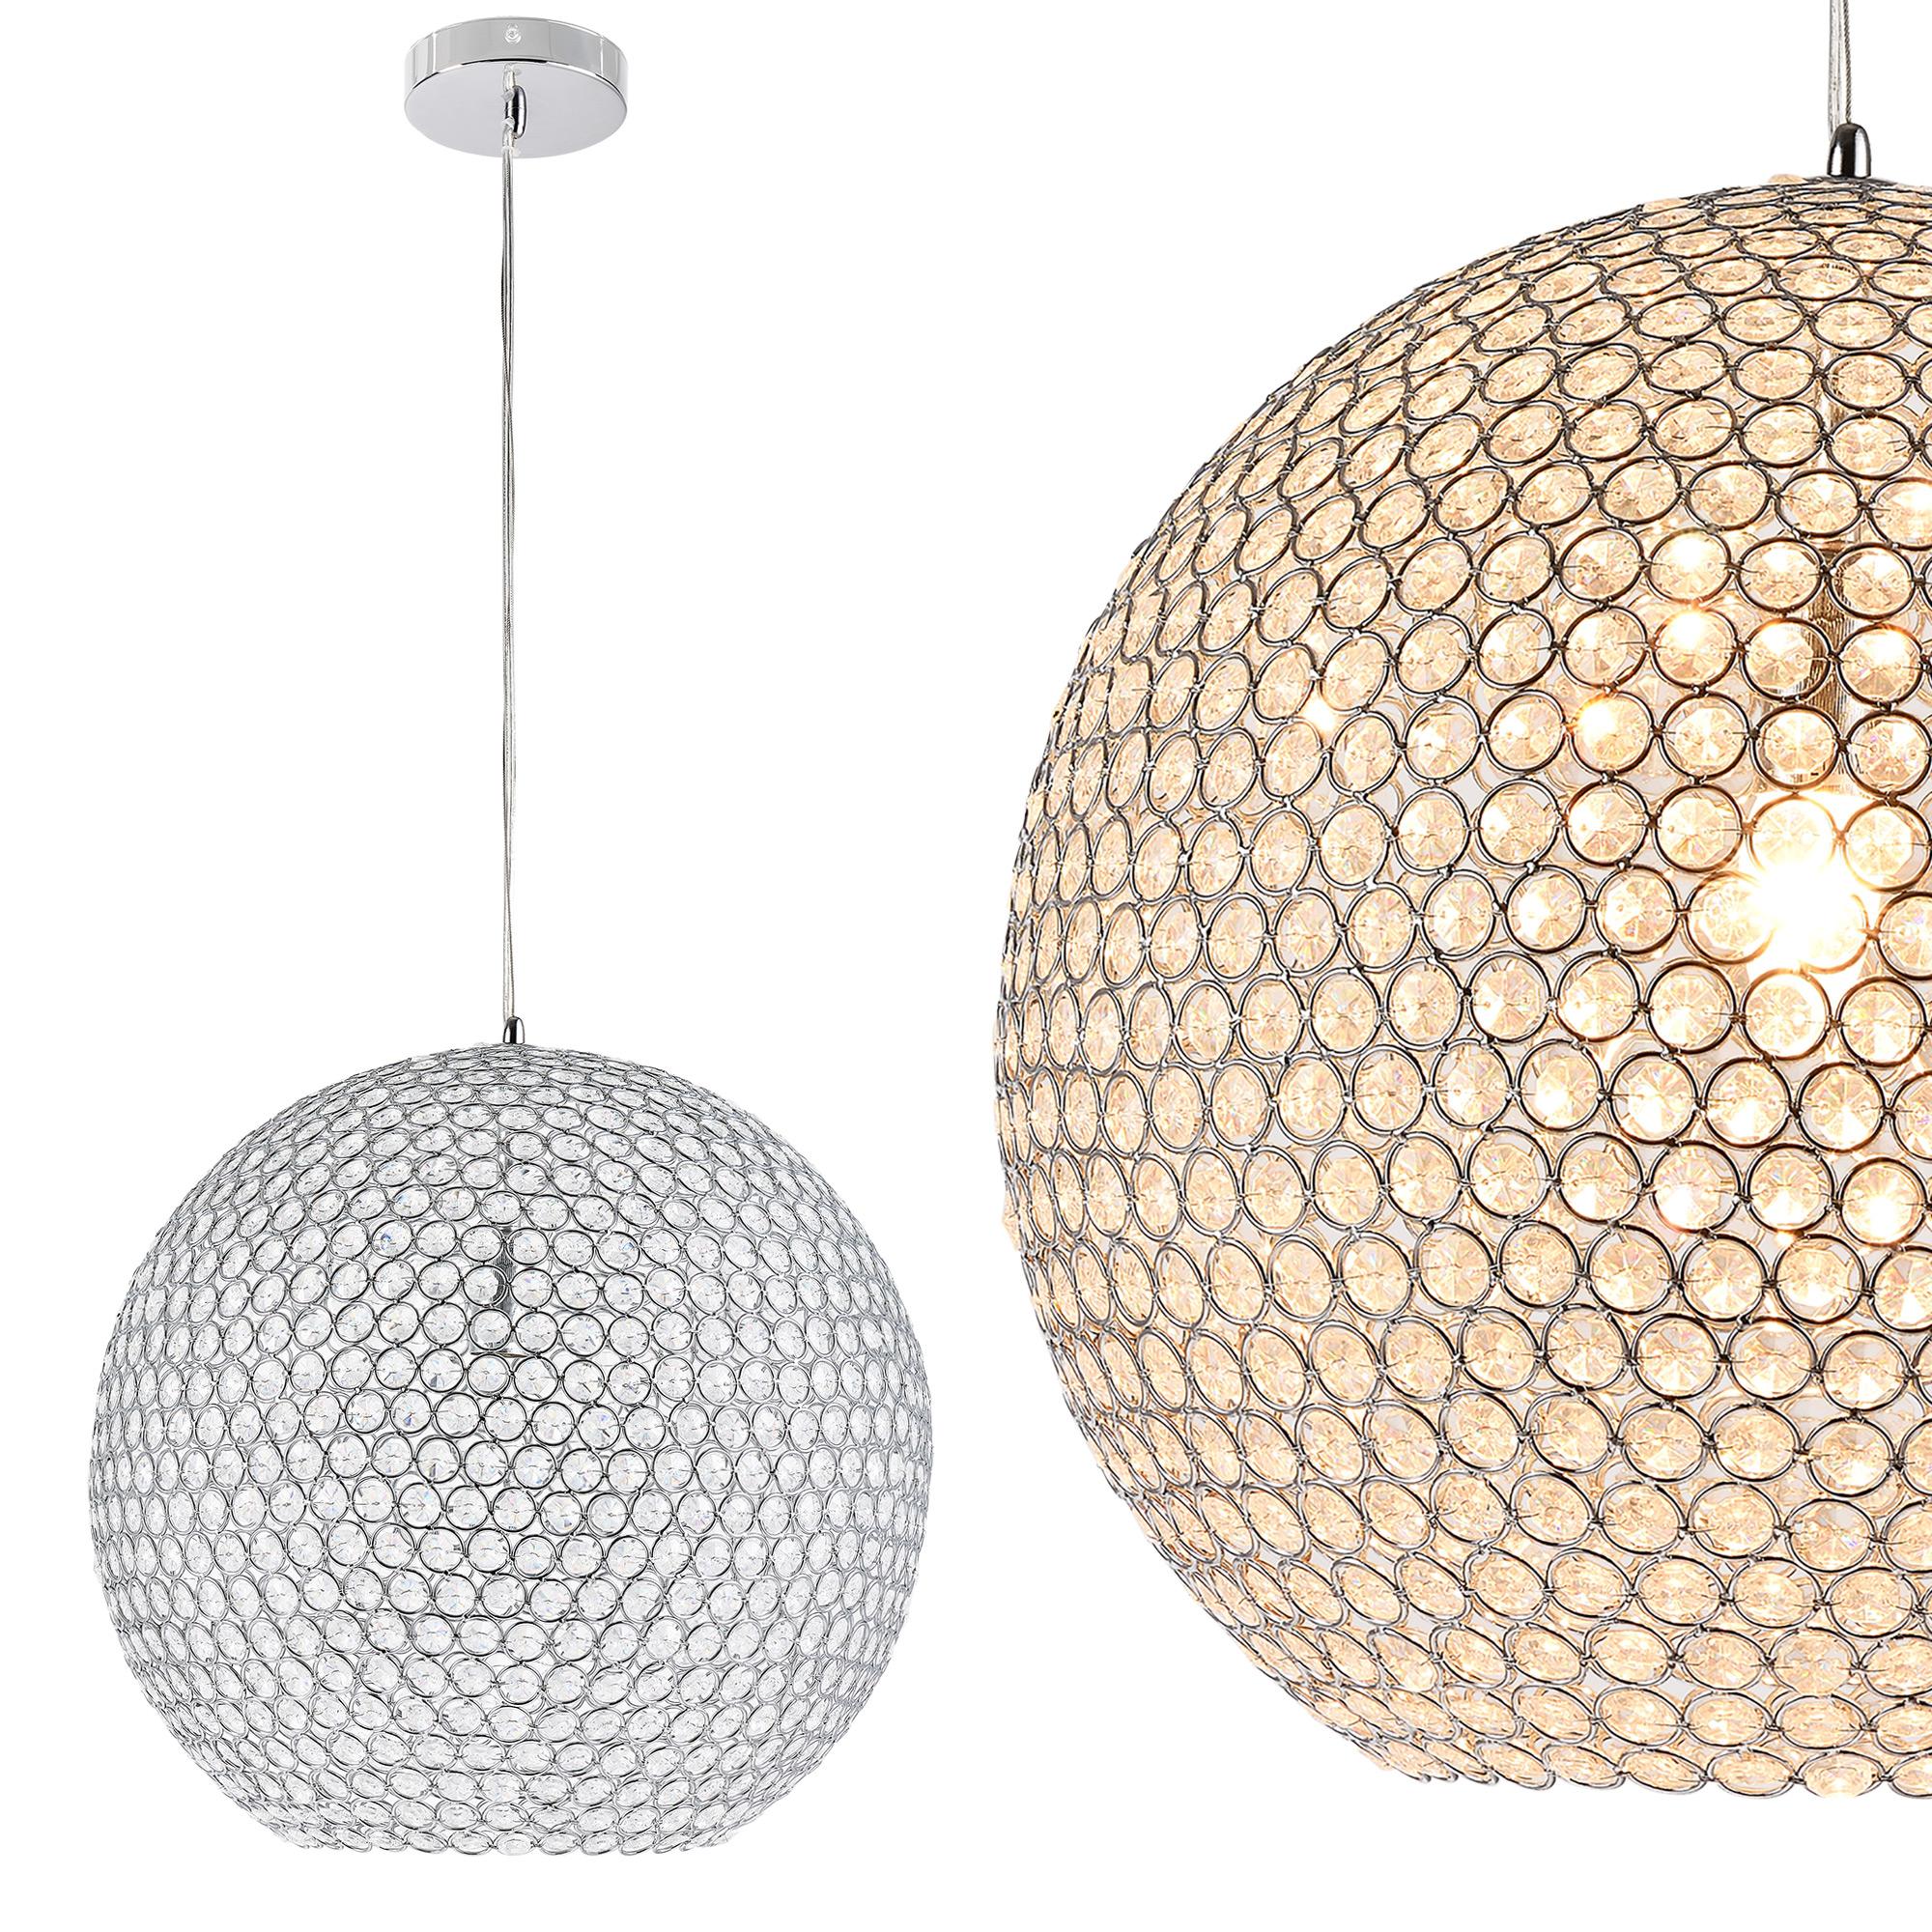 kristall deckenleuchte 38x38cm deckenlampe l ster zimmerlampe chrom ebay. Black Bedroom Furniture Sets. Home Design Ideas